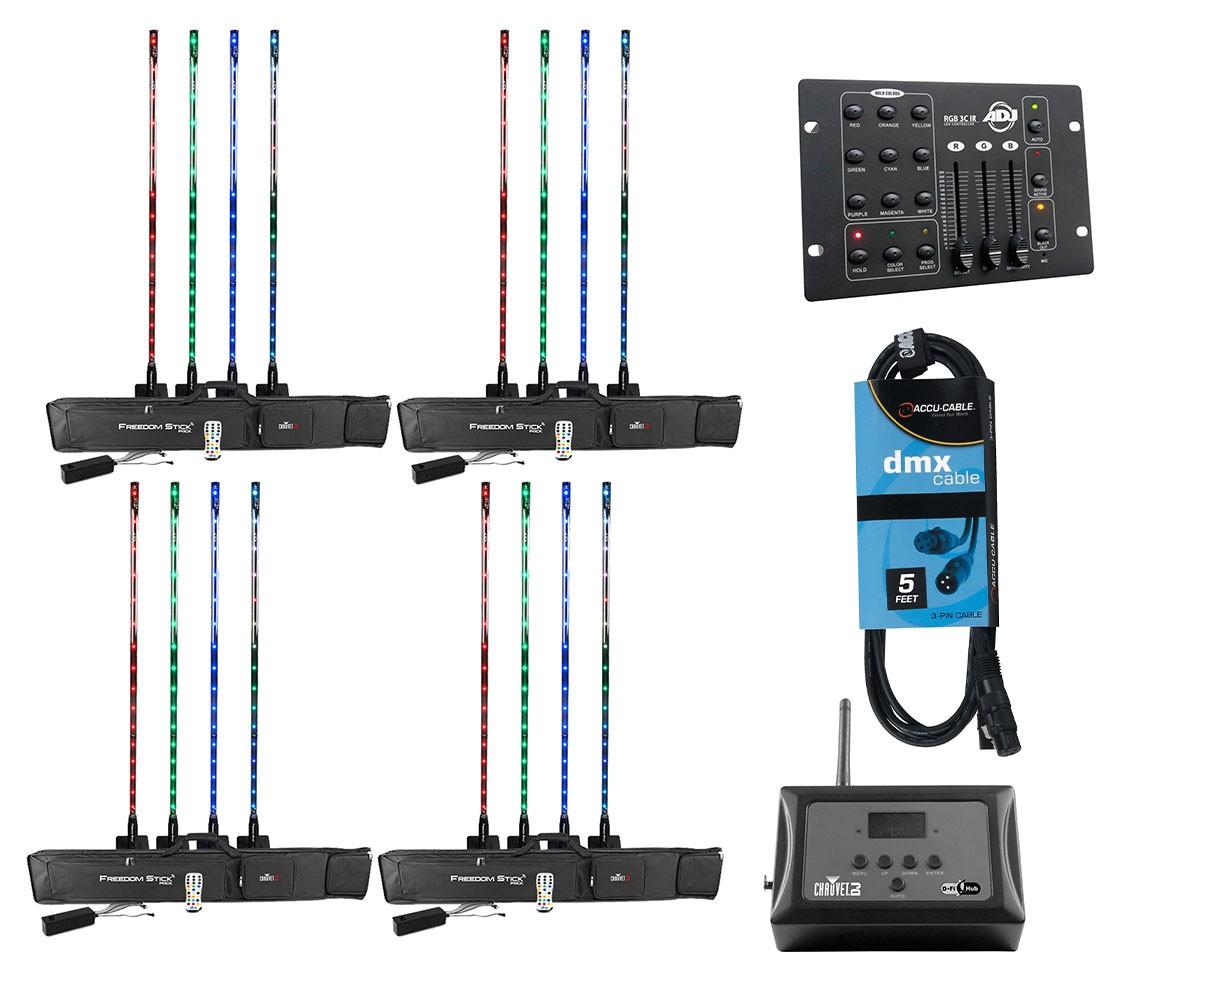 4x CHAUVET DJ Freedom Stick Pack + D-Fi Hub + RGB Controller + Cable